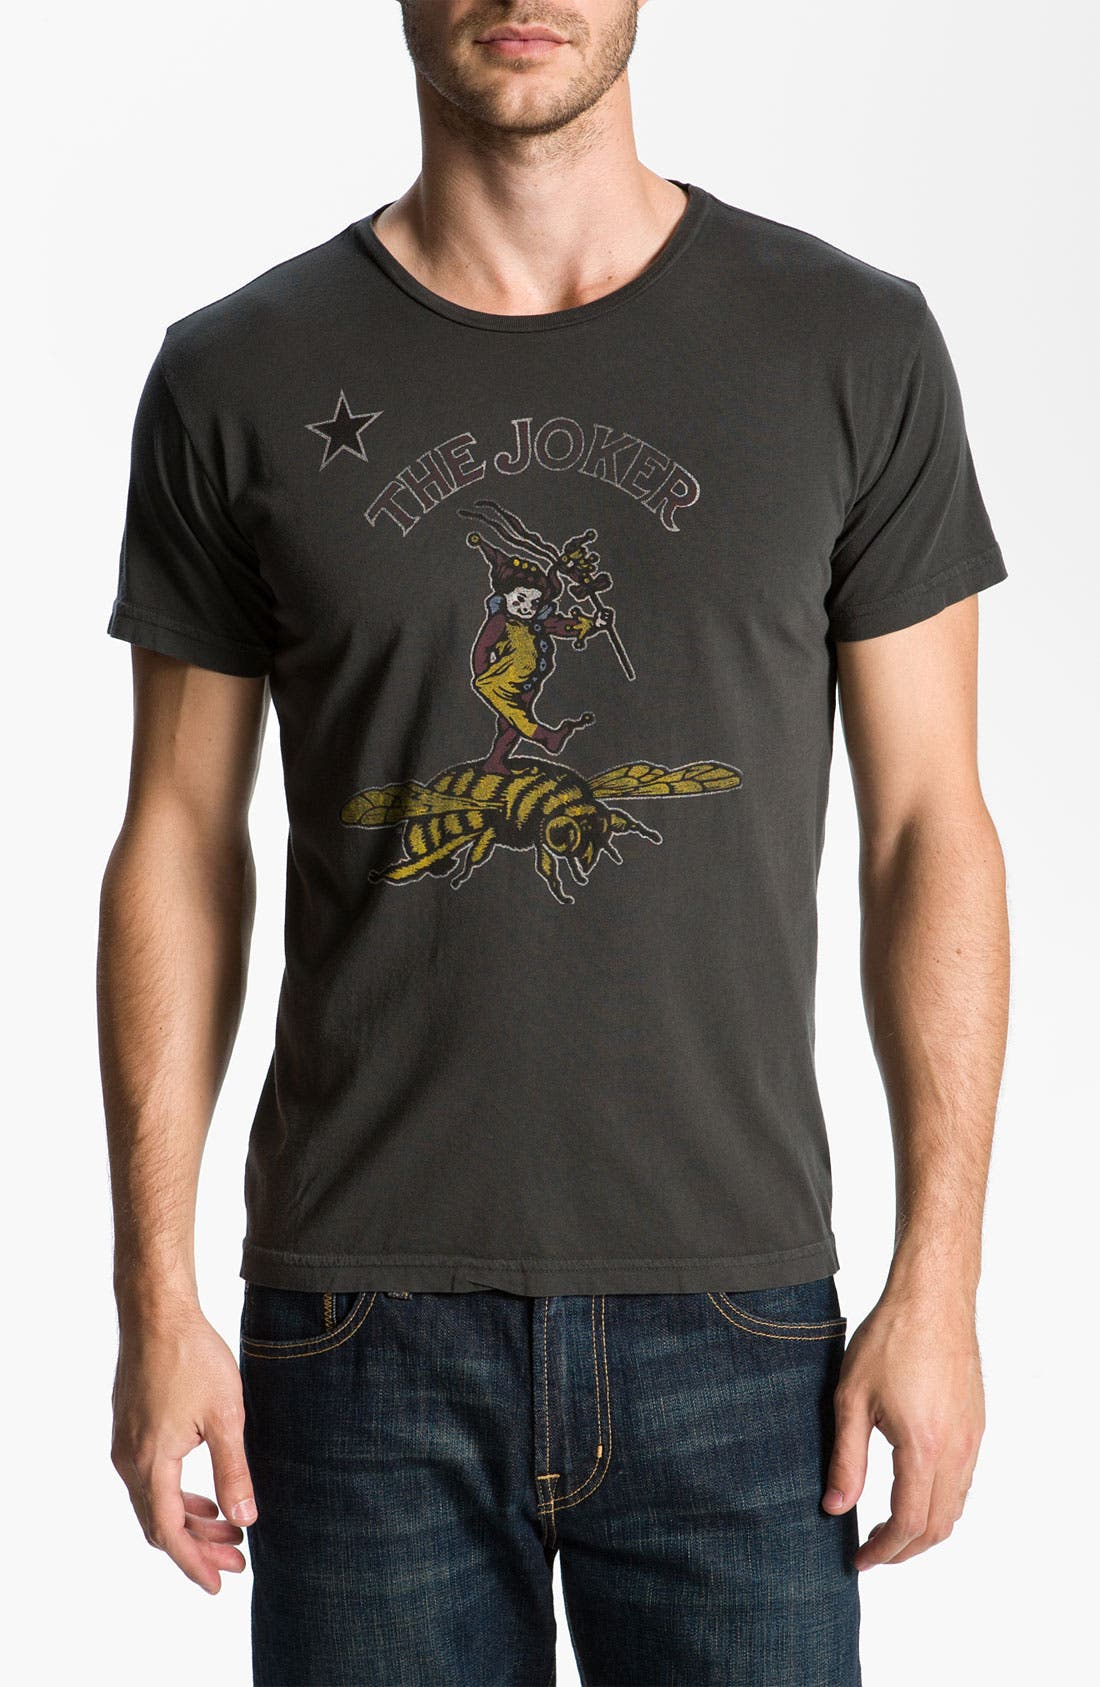 Main Image - Jacks & Jokers 'Joker Bee' T-Shirt